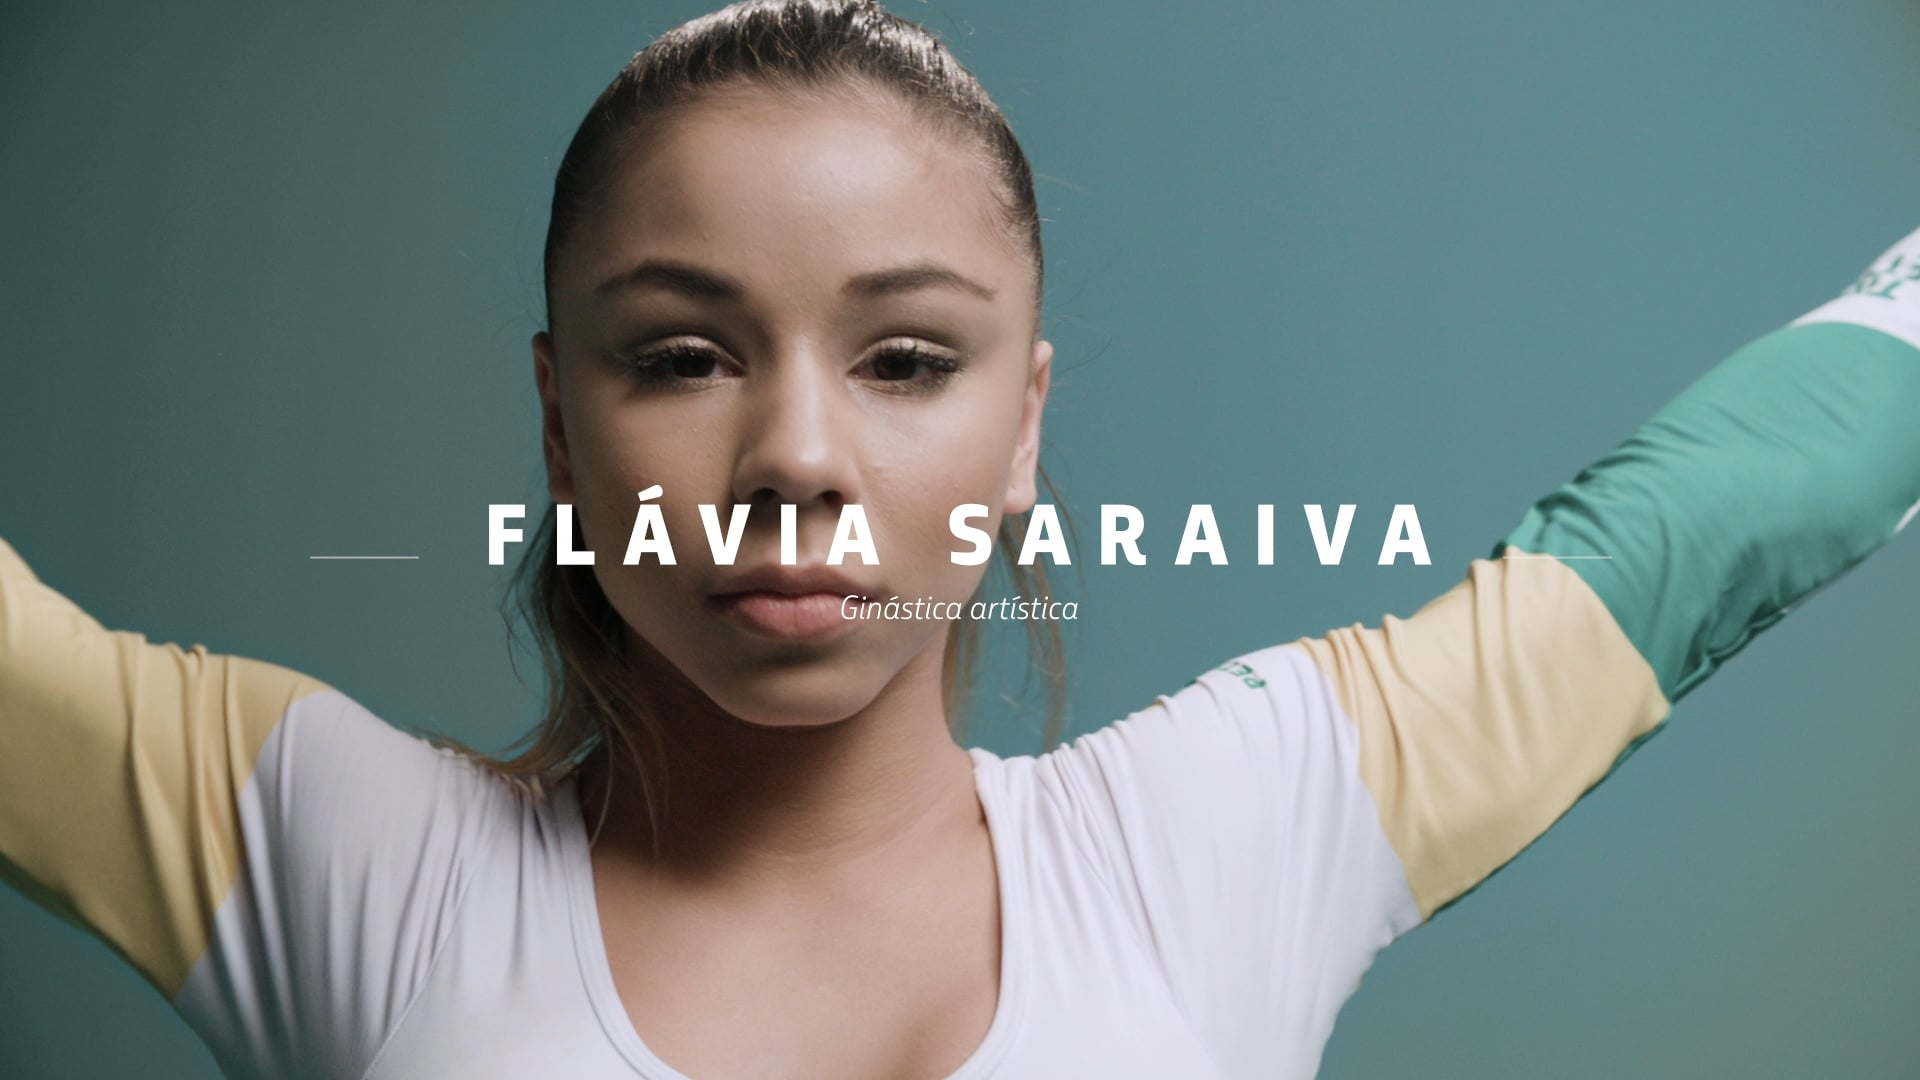 Time Petrobras - FLAVIA SARAIVA